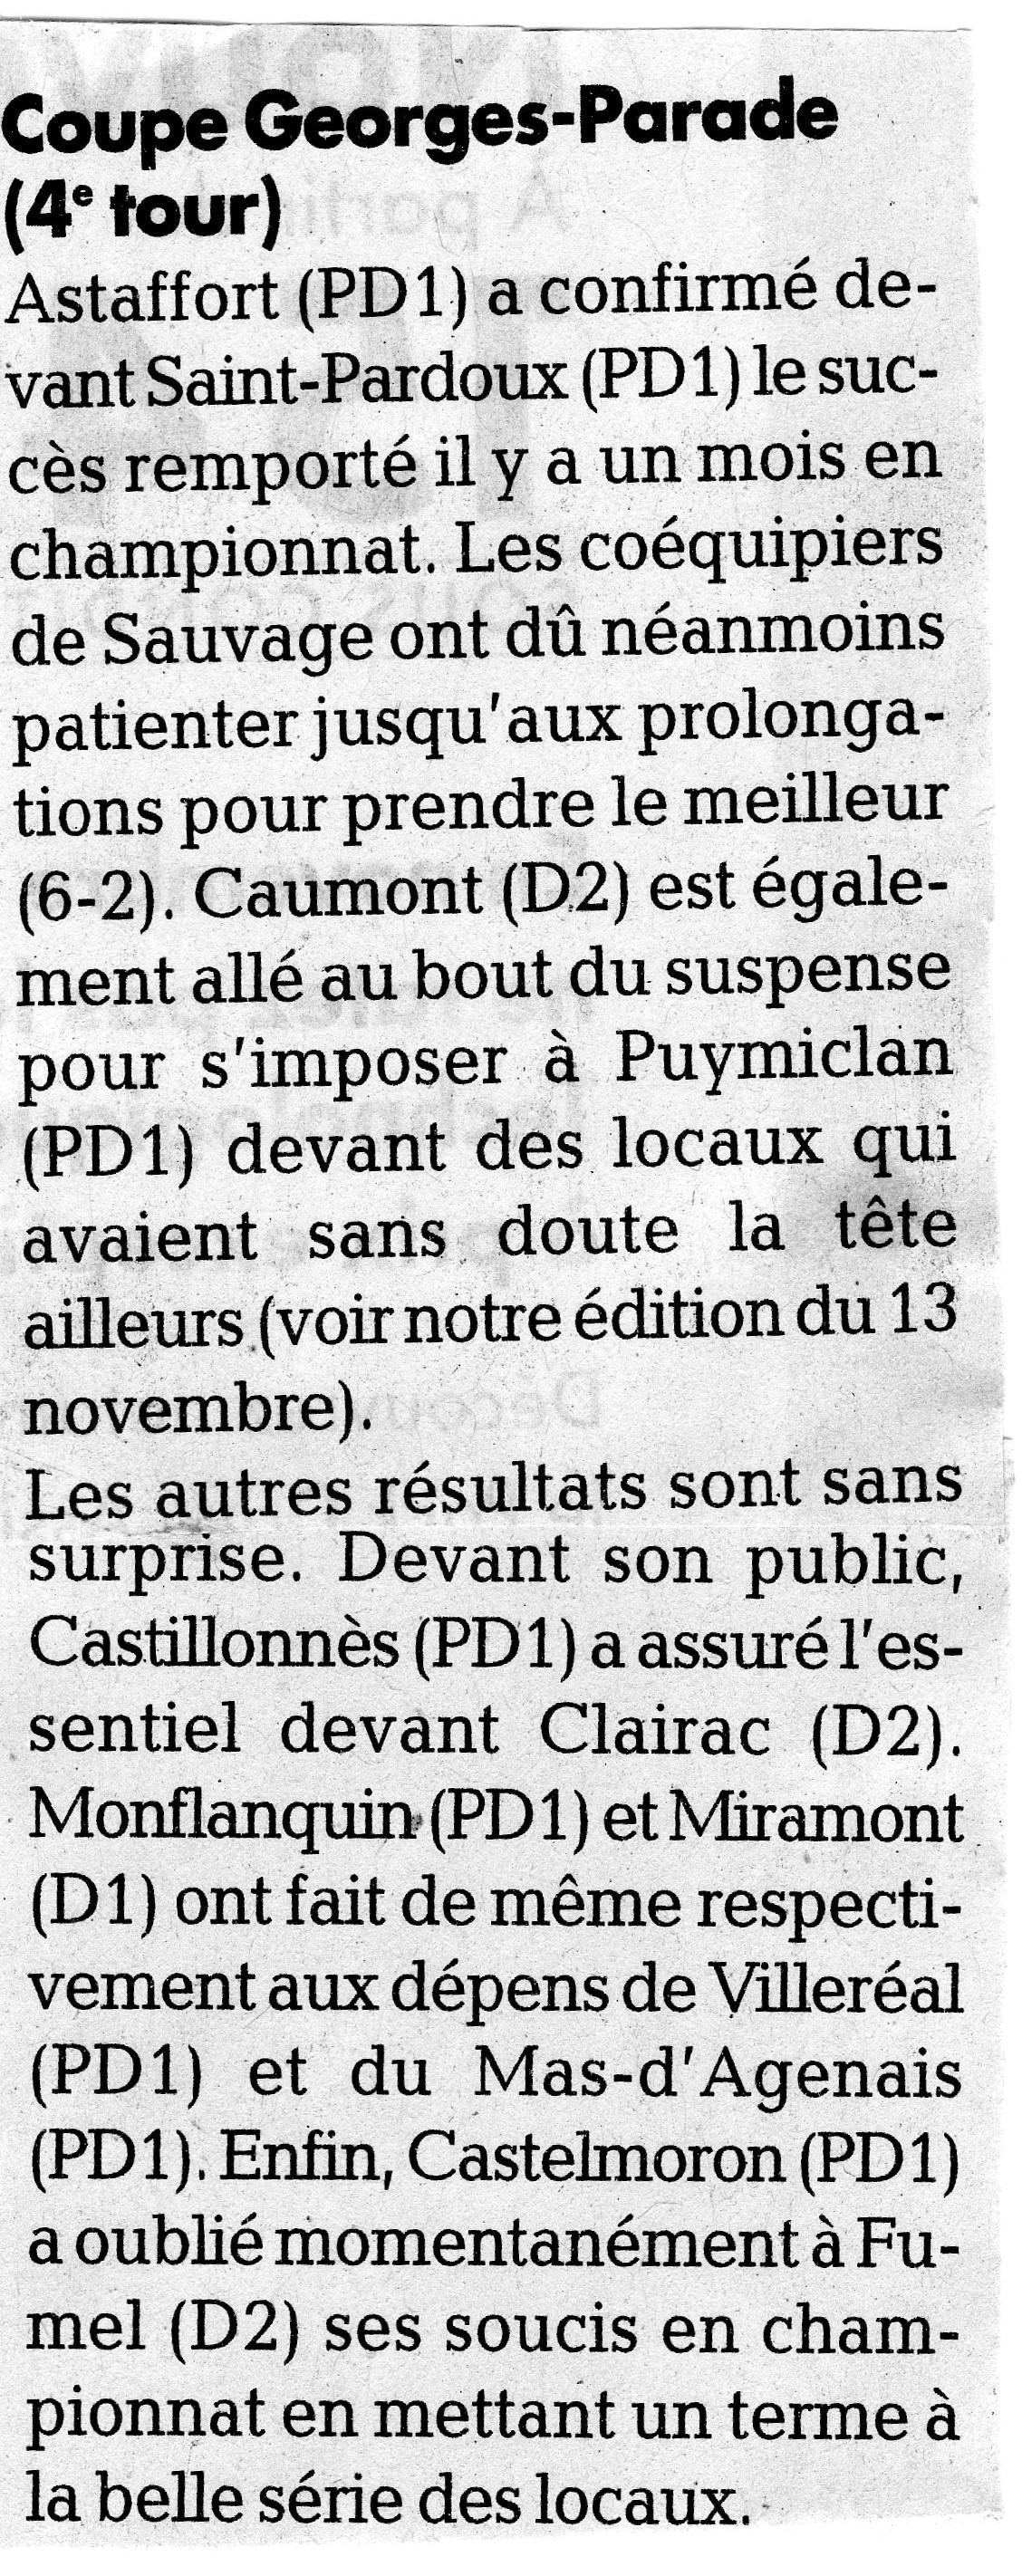 http://staff.footeo.com/uploads/asccl/Medias/la_depeche_19_11_2013_clairac.jpg